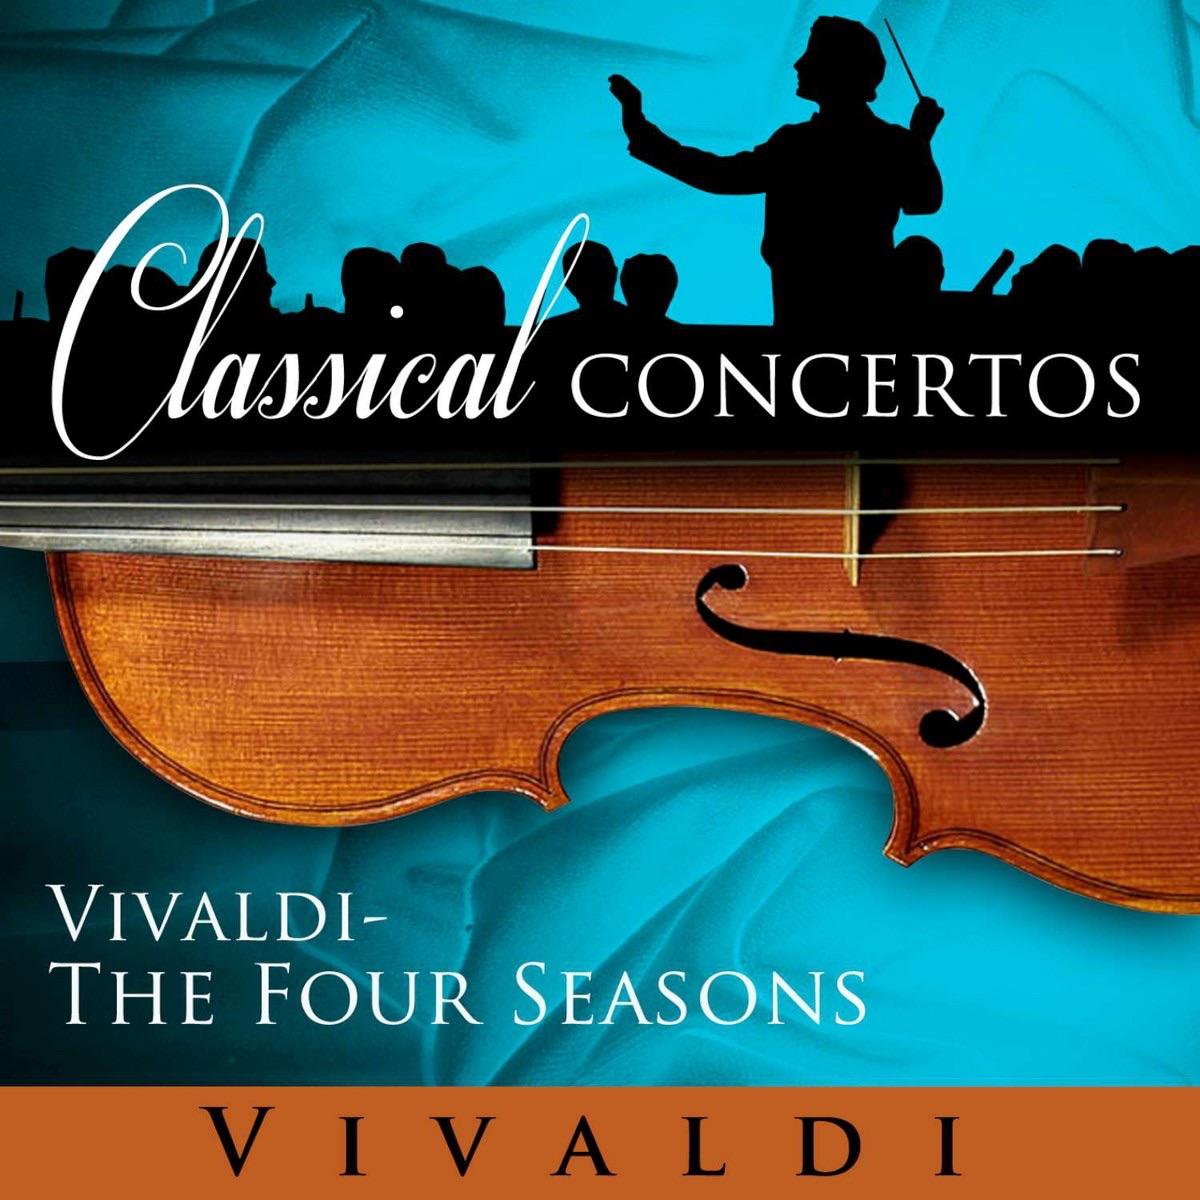 Classical Concertos - Vivaldi: The Four Seasons